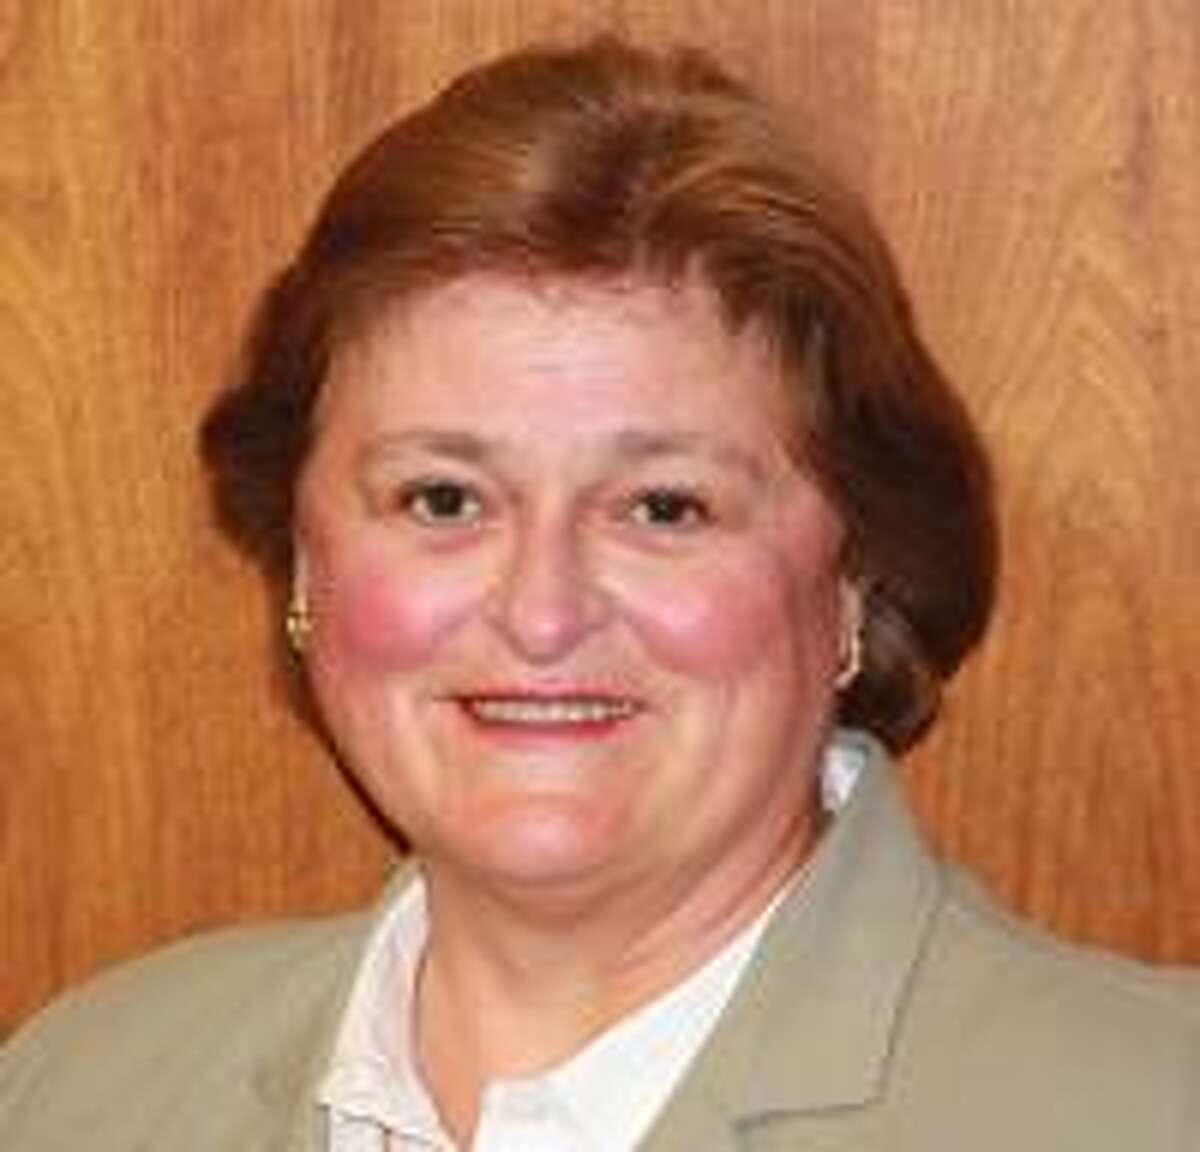 Connecticut Chief U. S. District Judge Janet C. Hall